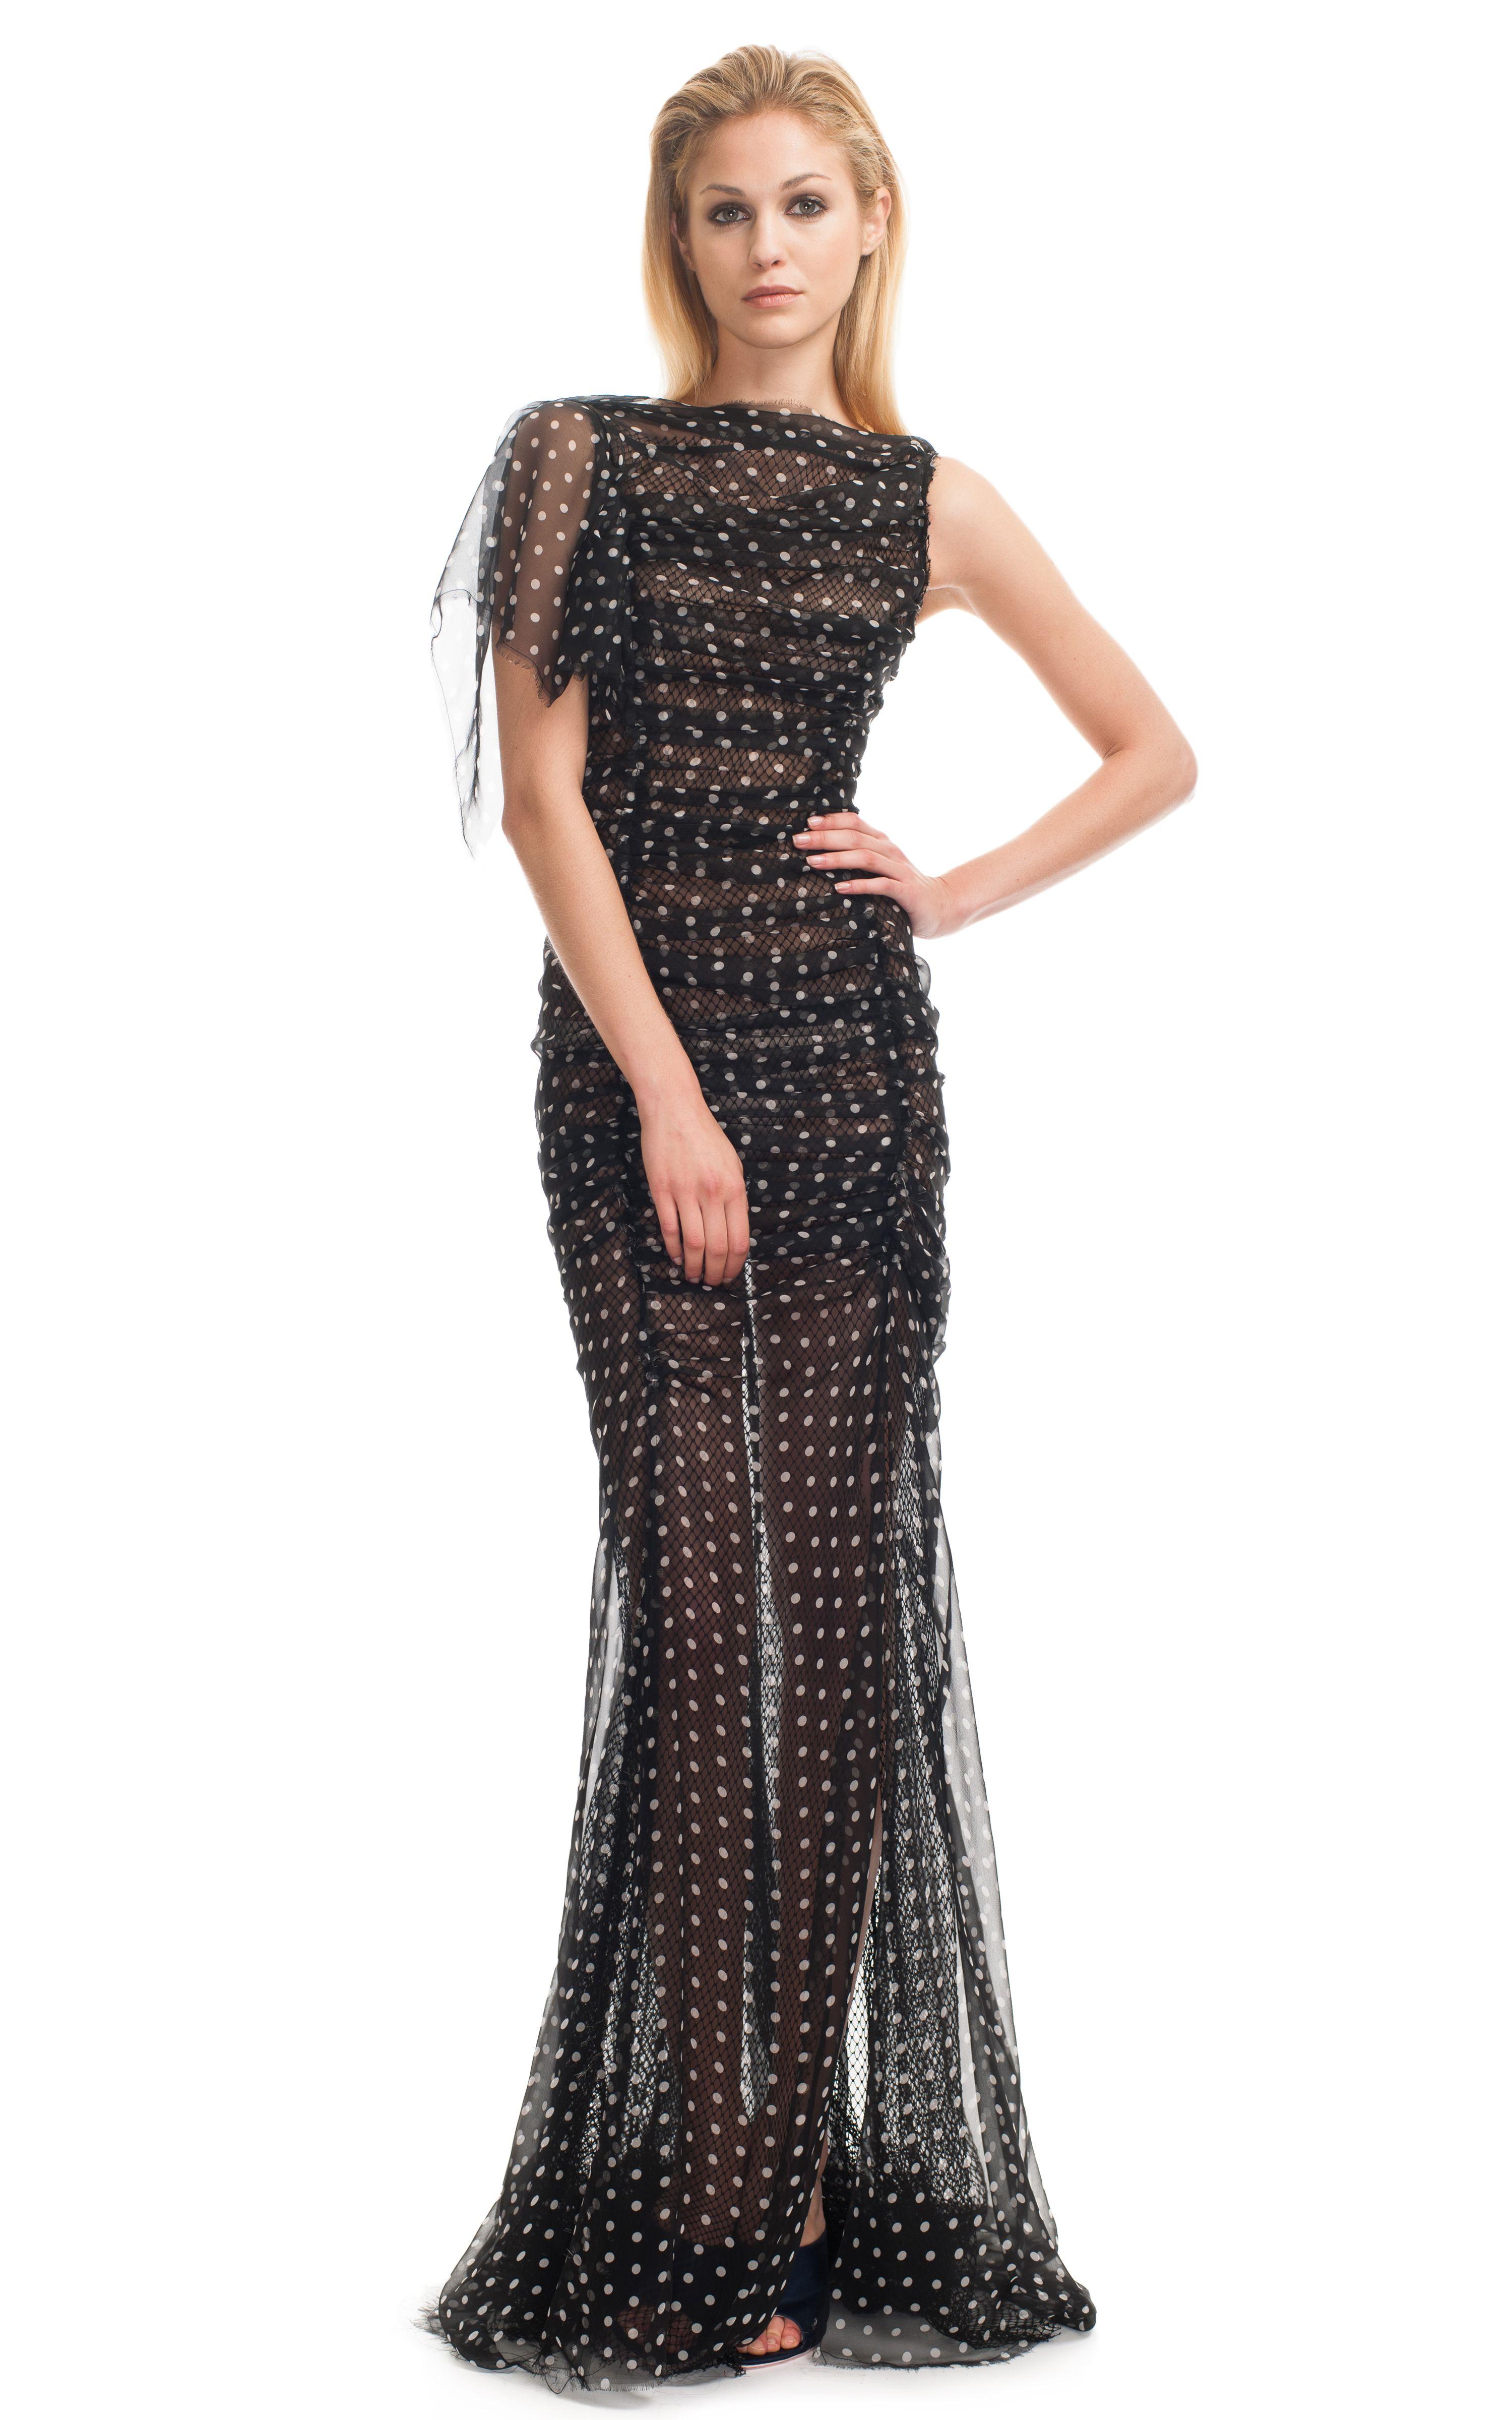 Nina Ricci Dot Print Long Silk Chiffon Dress At Moda Operandi